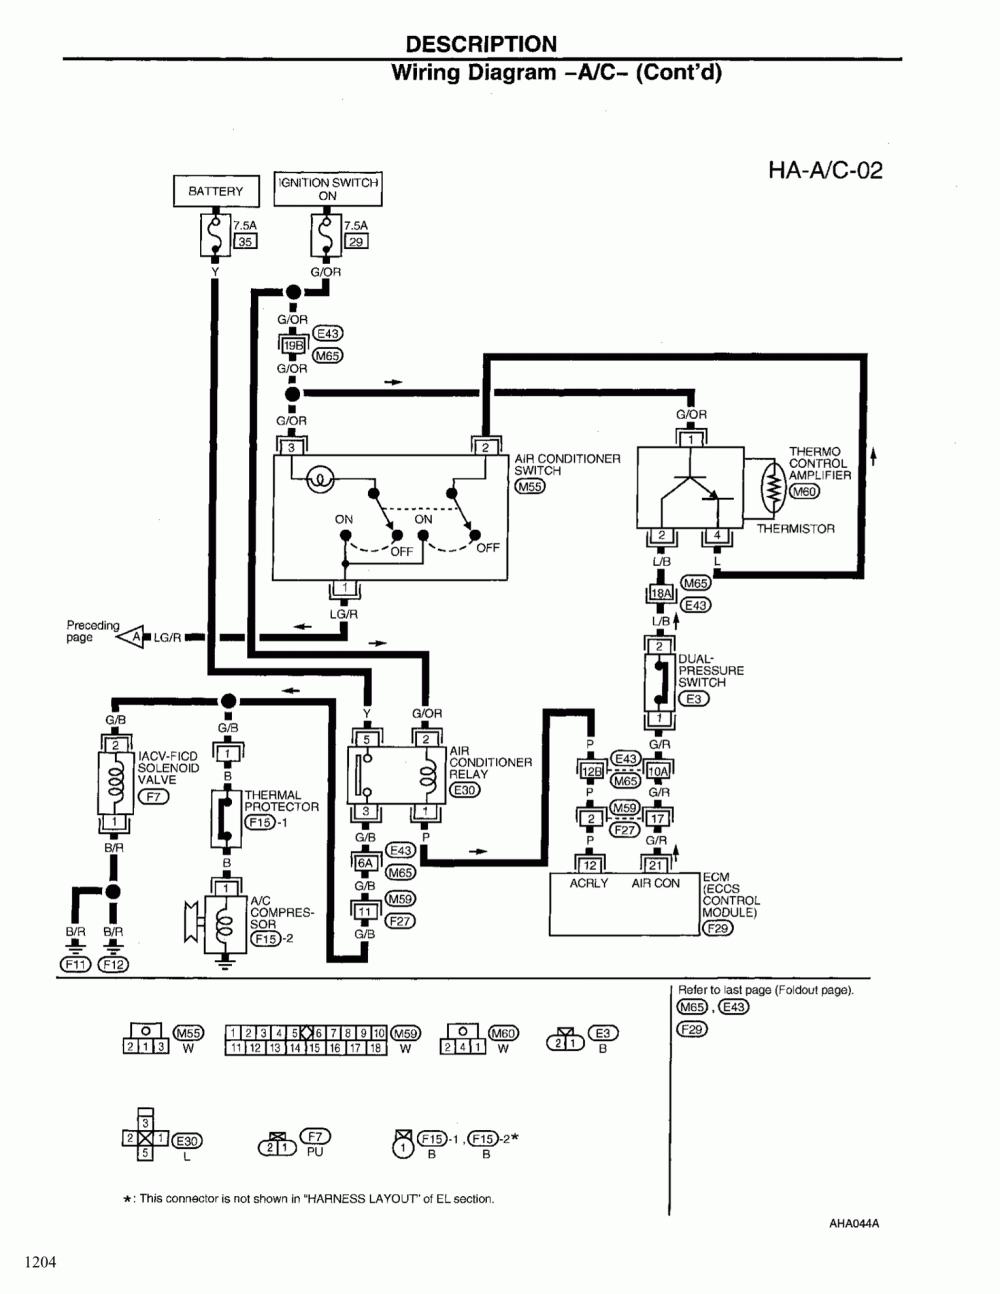 2001 xterra ignition wiring diagram - wiring diagrams all drop-what -  drop-what.babelweb.it  babelweb.it